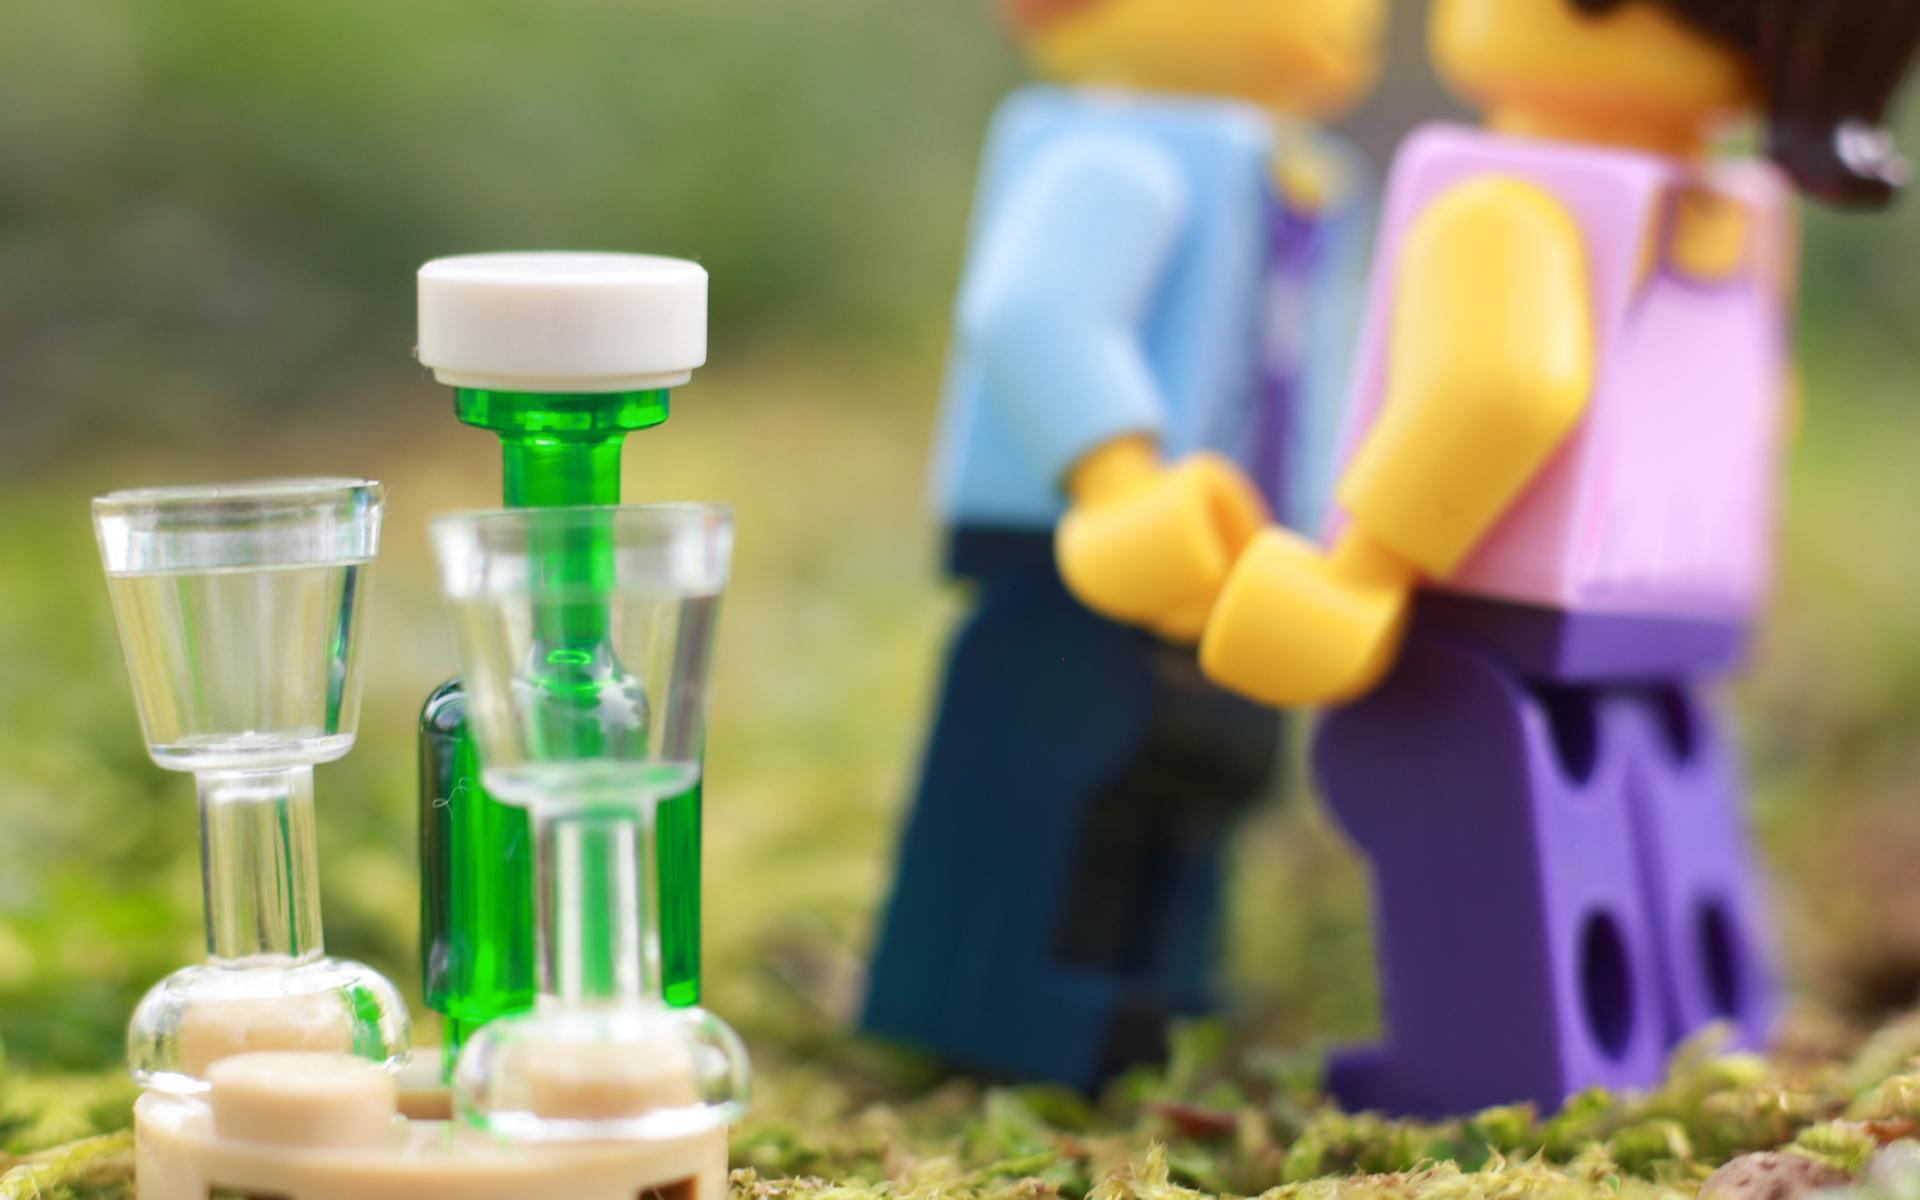 Review: LEGO 40236 Romantic Valentine Picnic